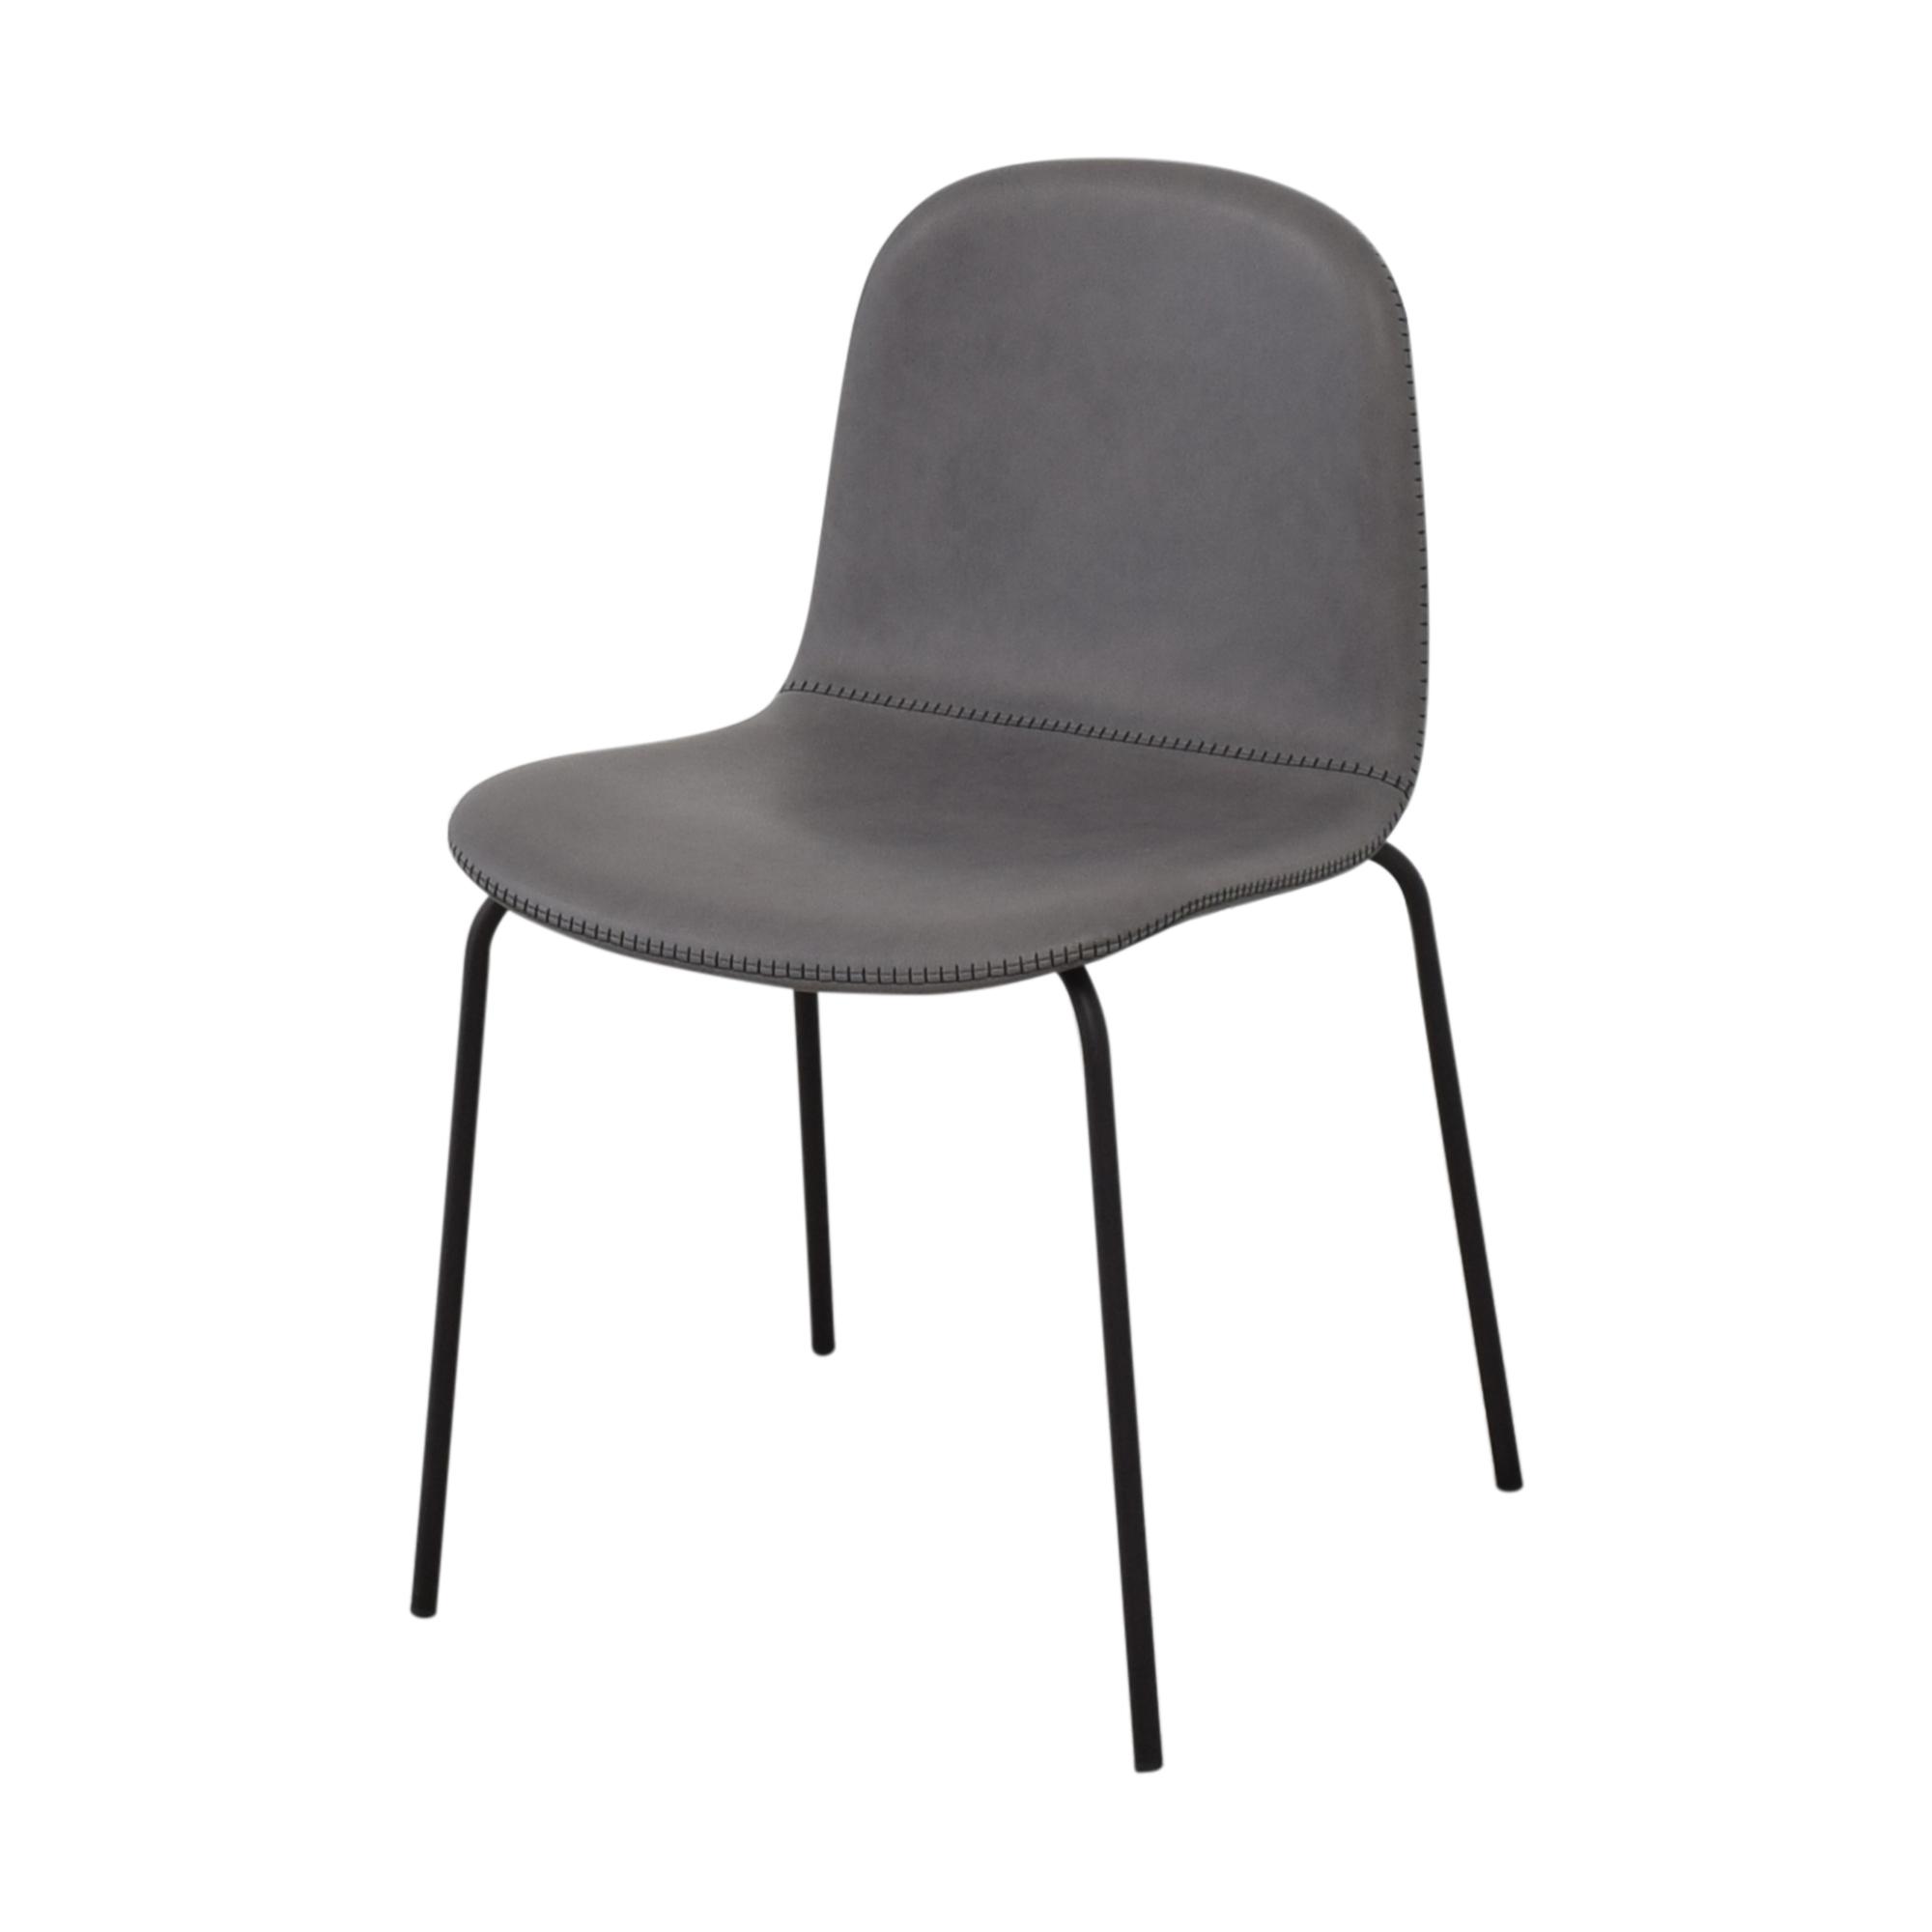 buy CB2 Primitivo Grey Chairs CB2 Chairs